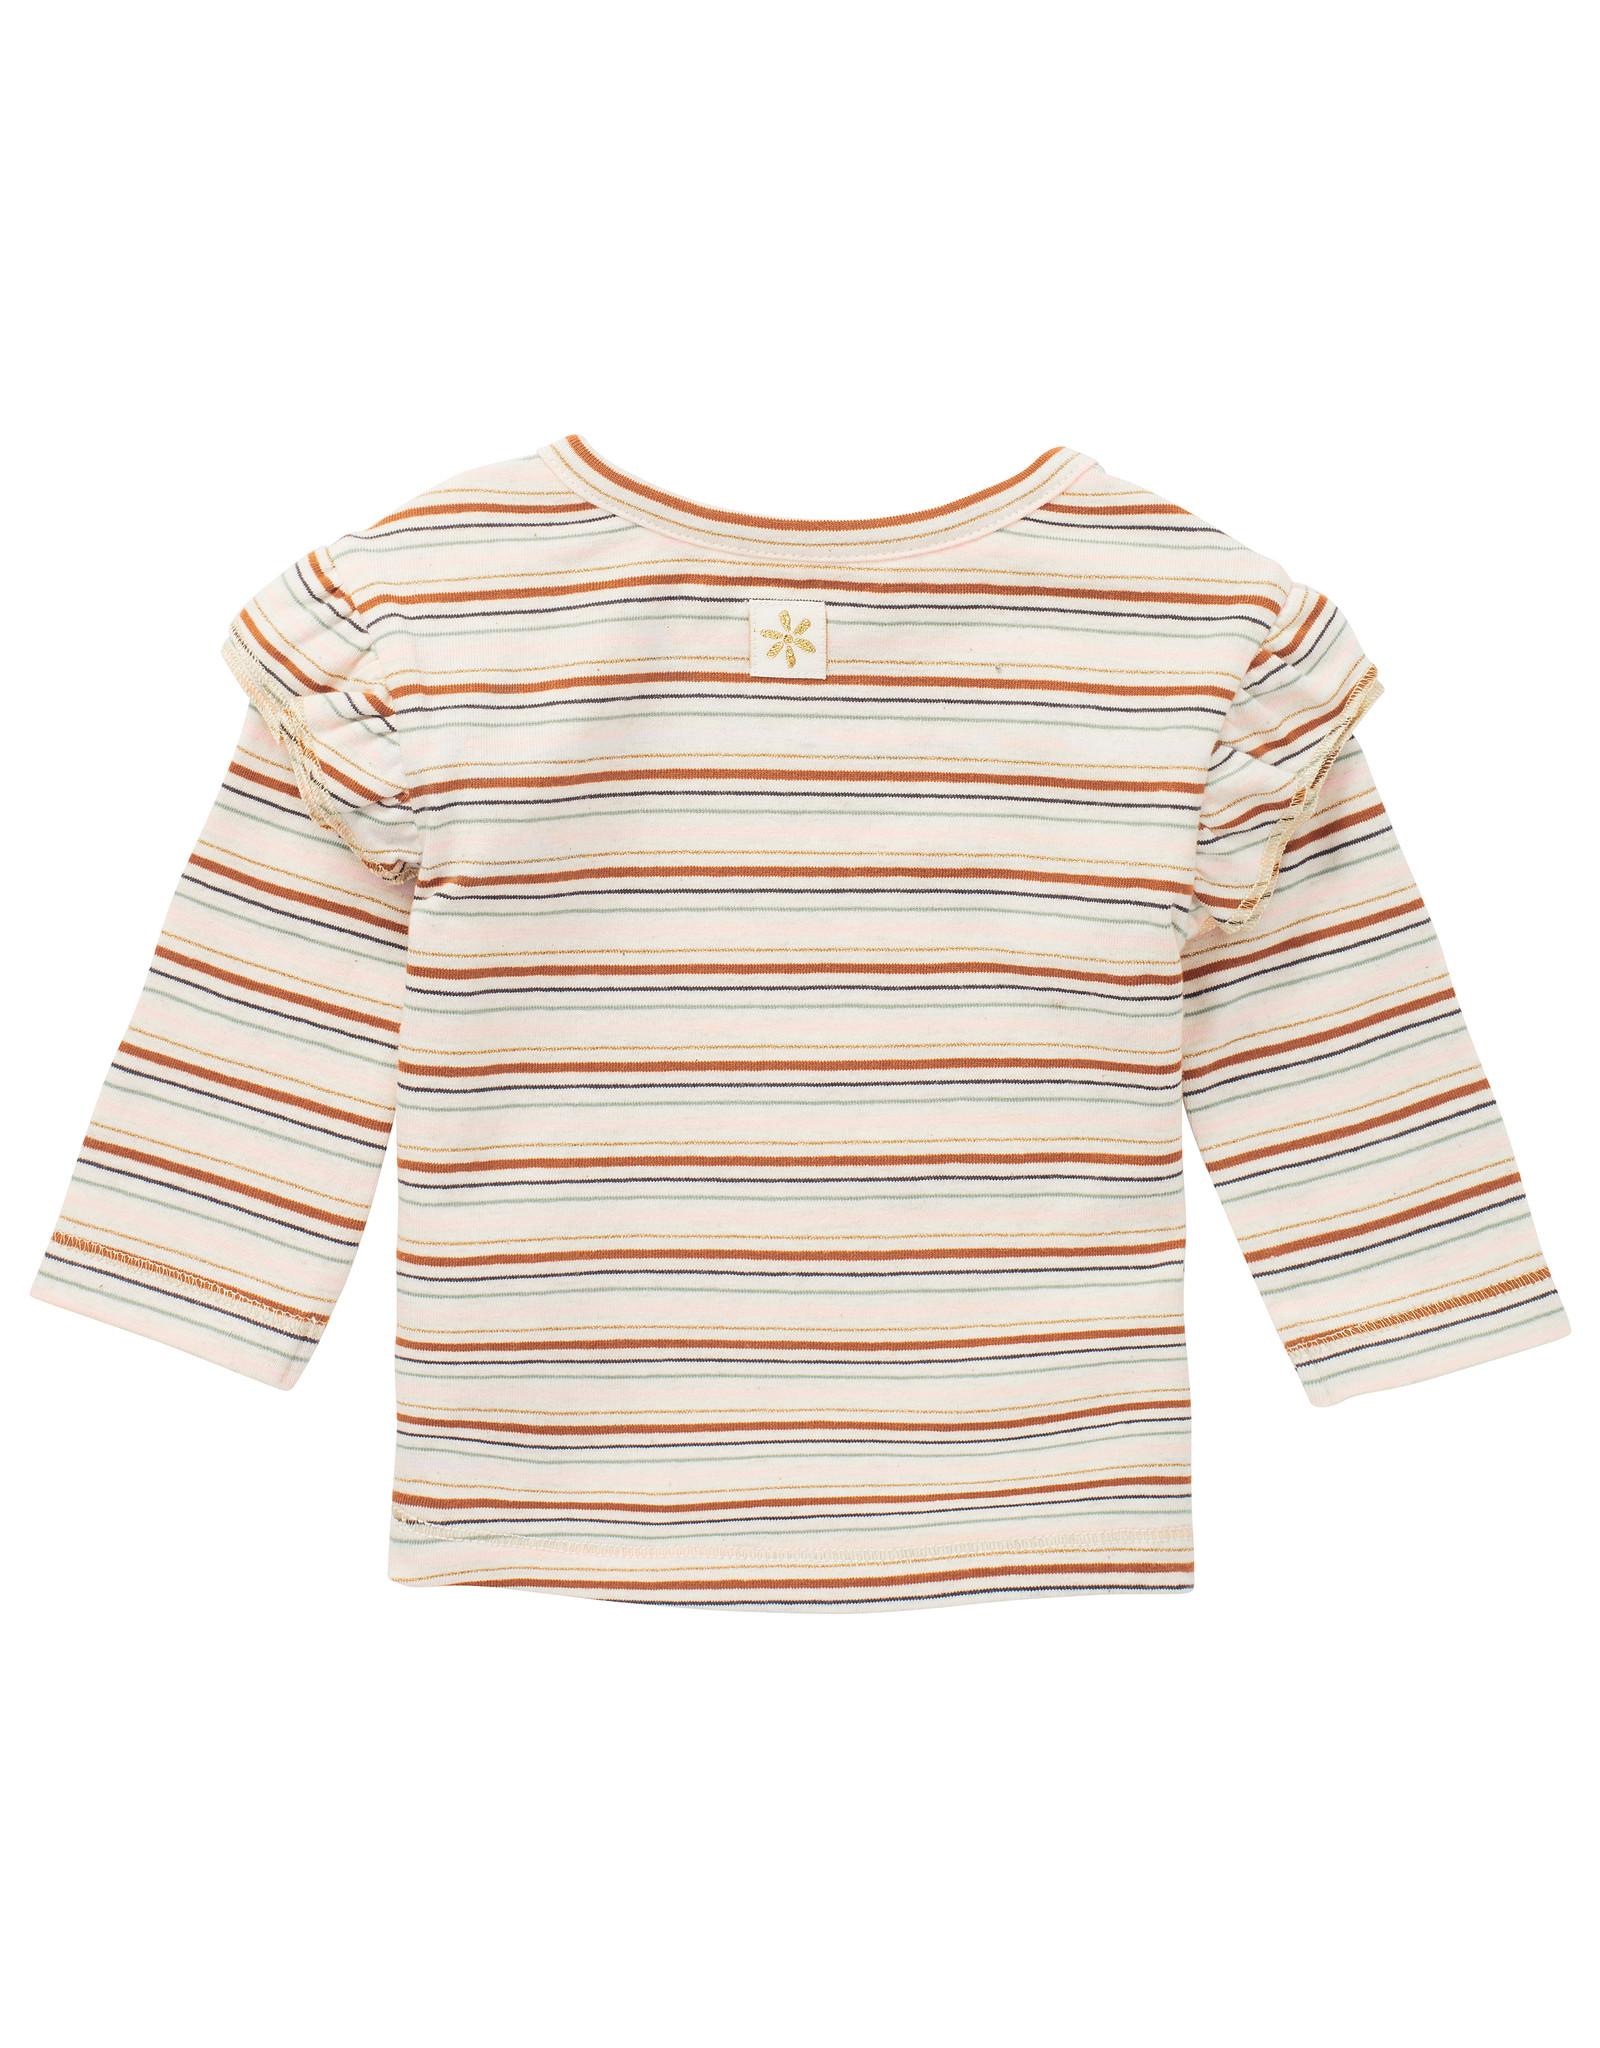 Noppies G T-shirt LS Mercier YD Str, RAS1202 Oatmeal